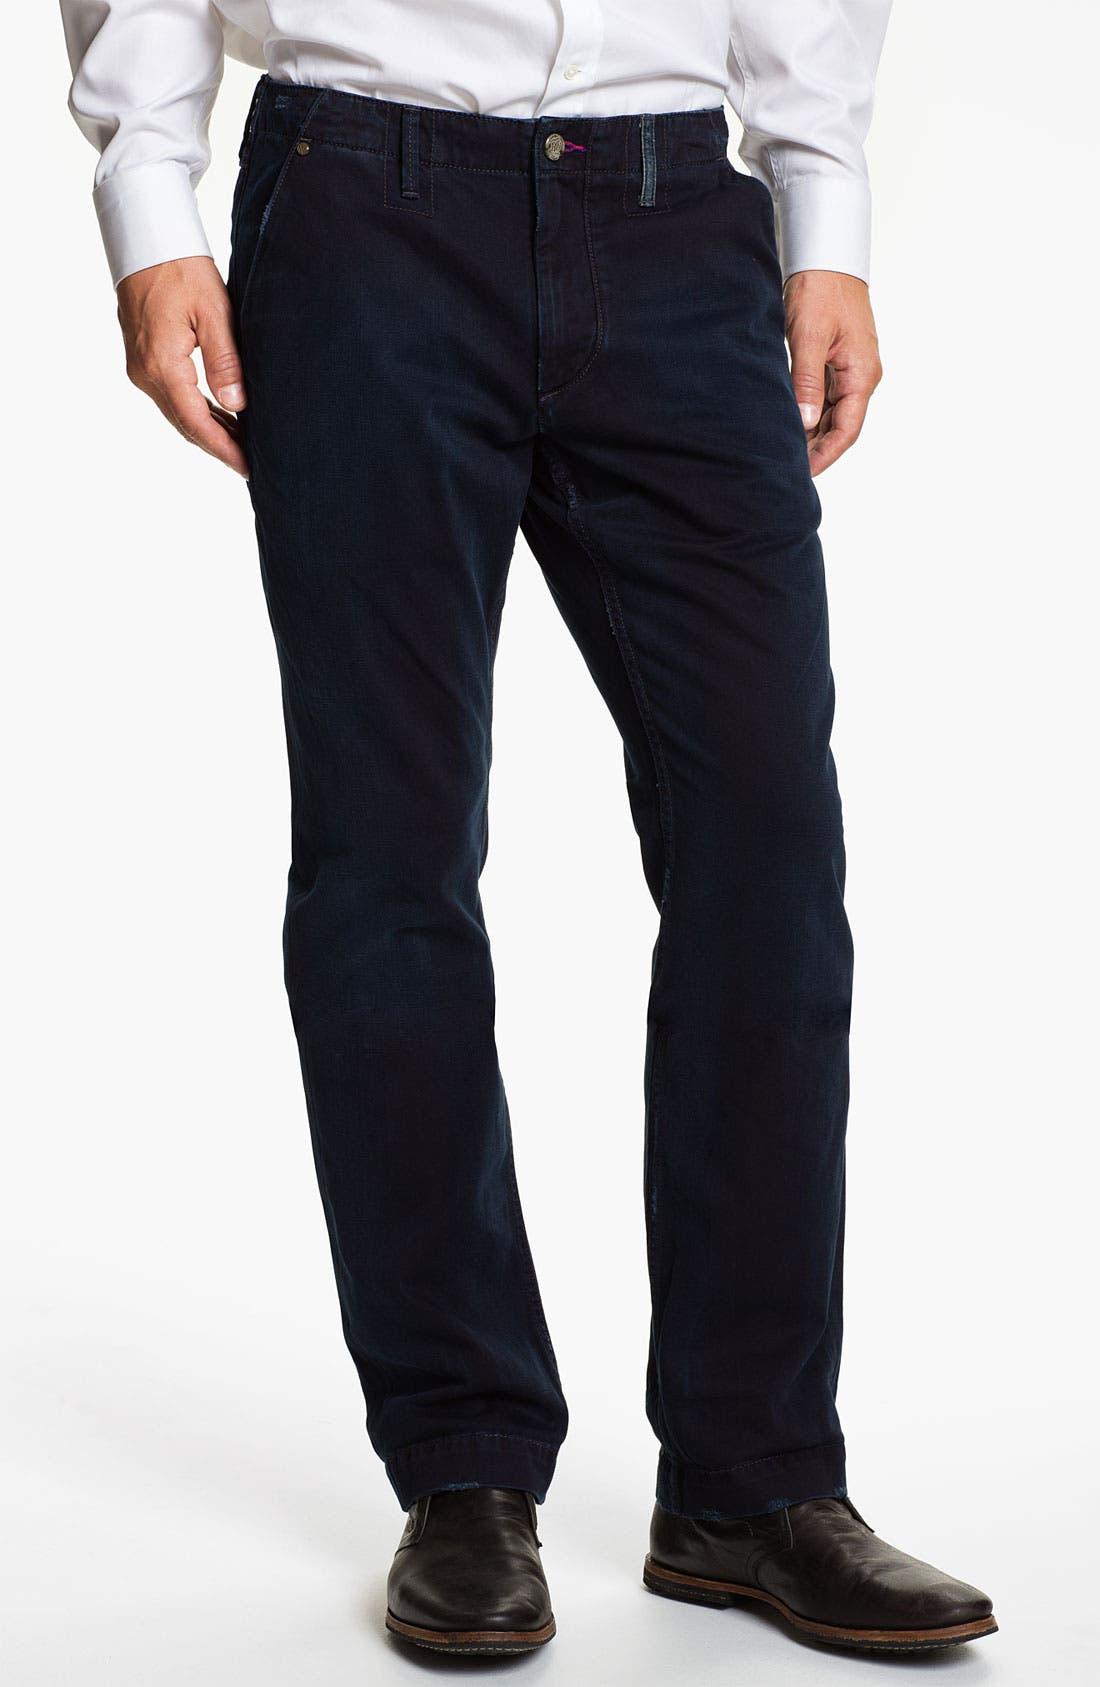 Main Image - Robert Graham Jeans 'Blue Tar' Classic Fit Straight Leg Chinos